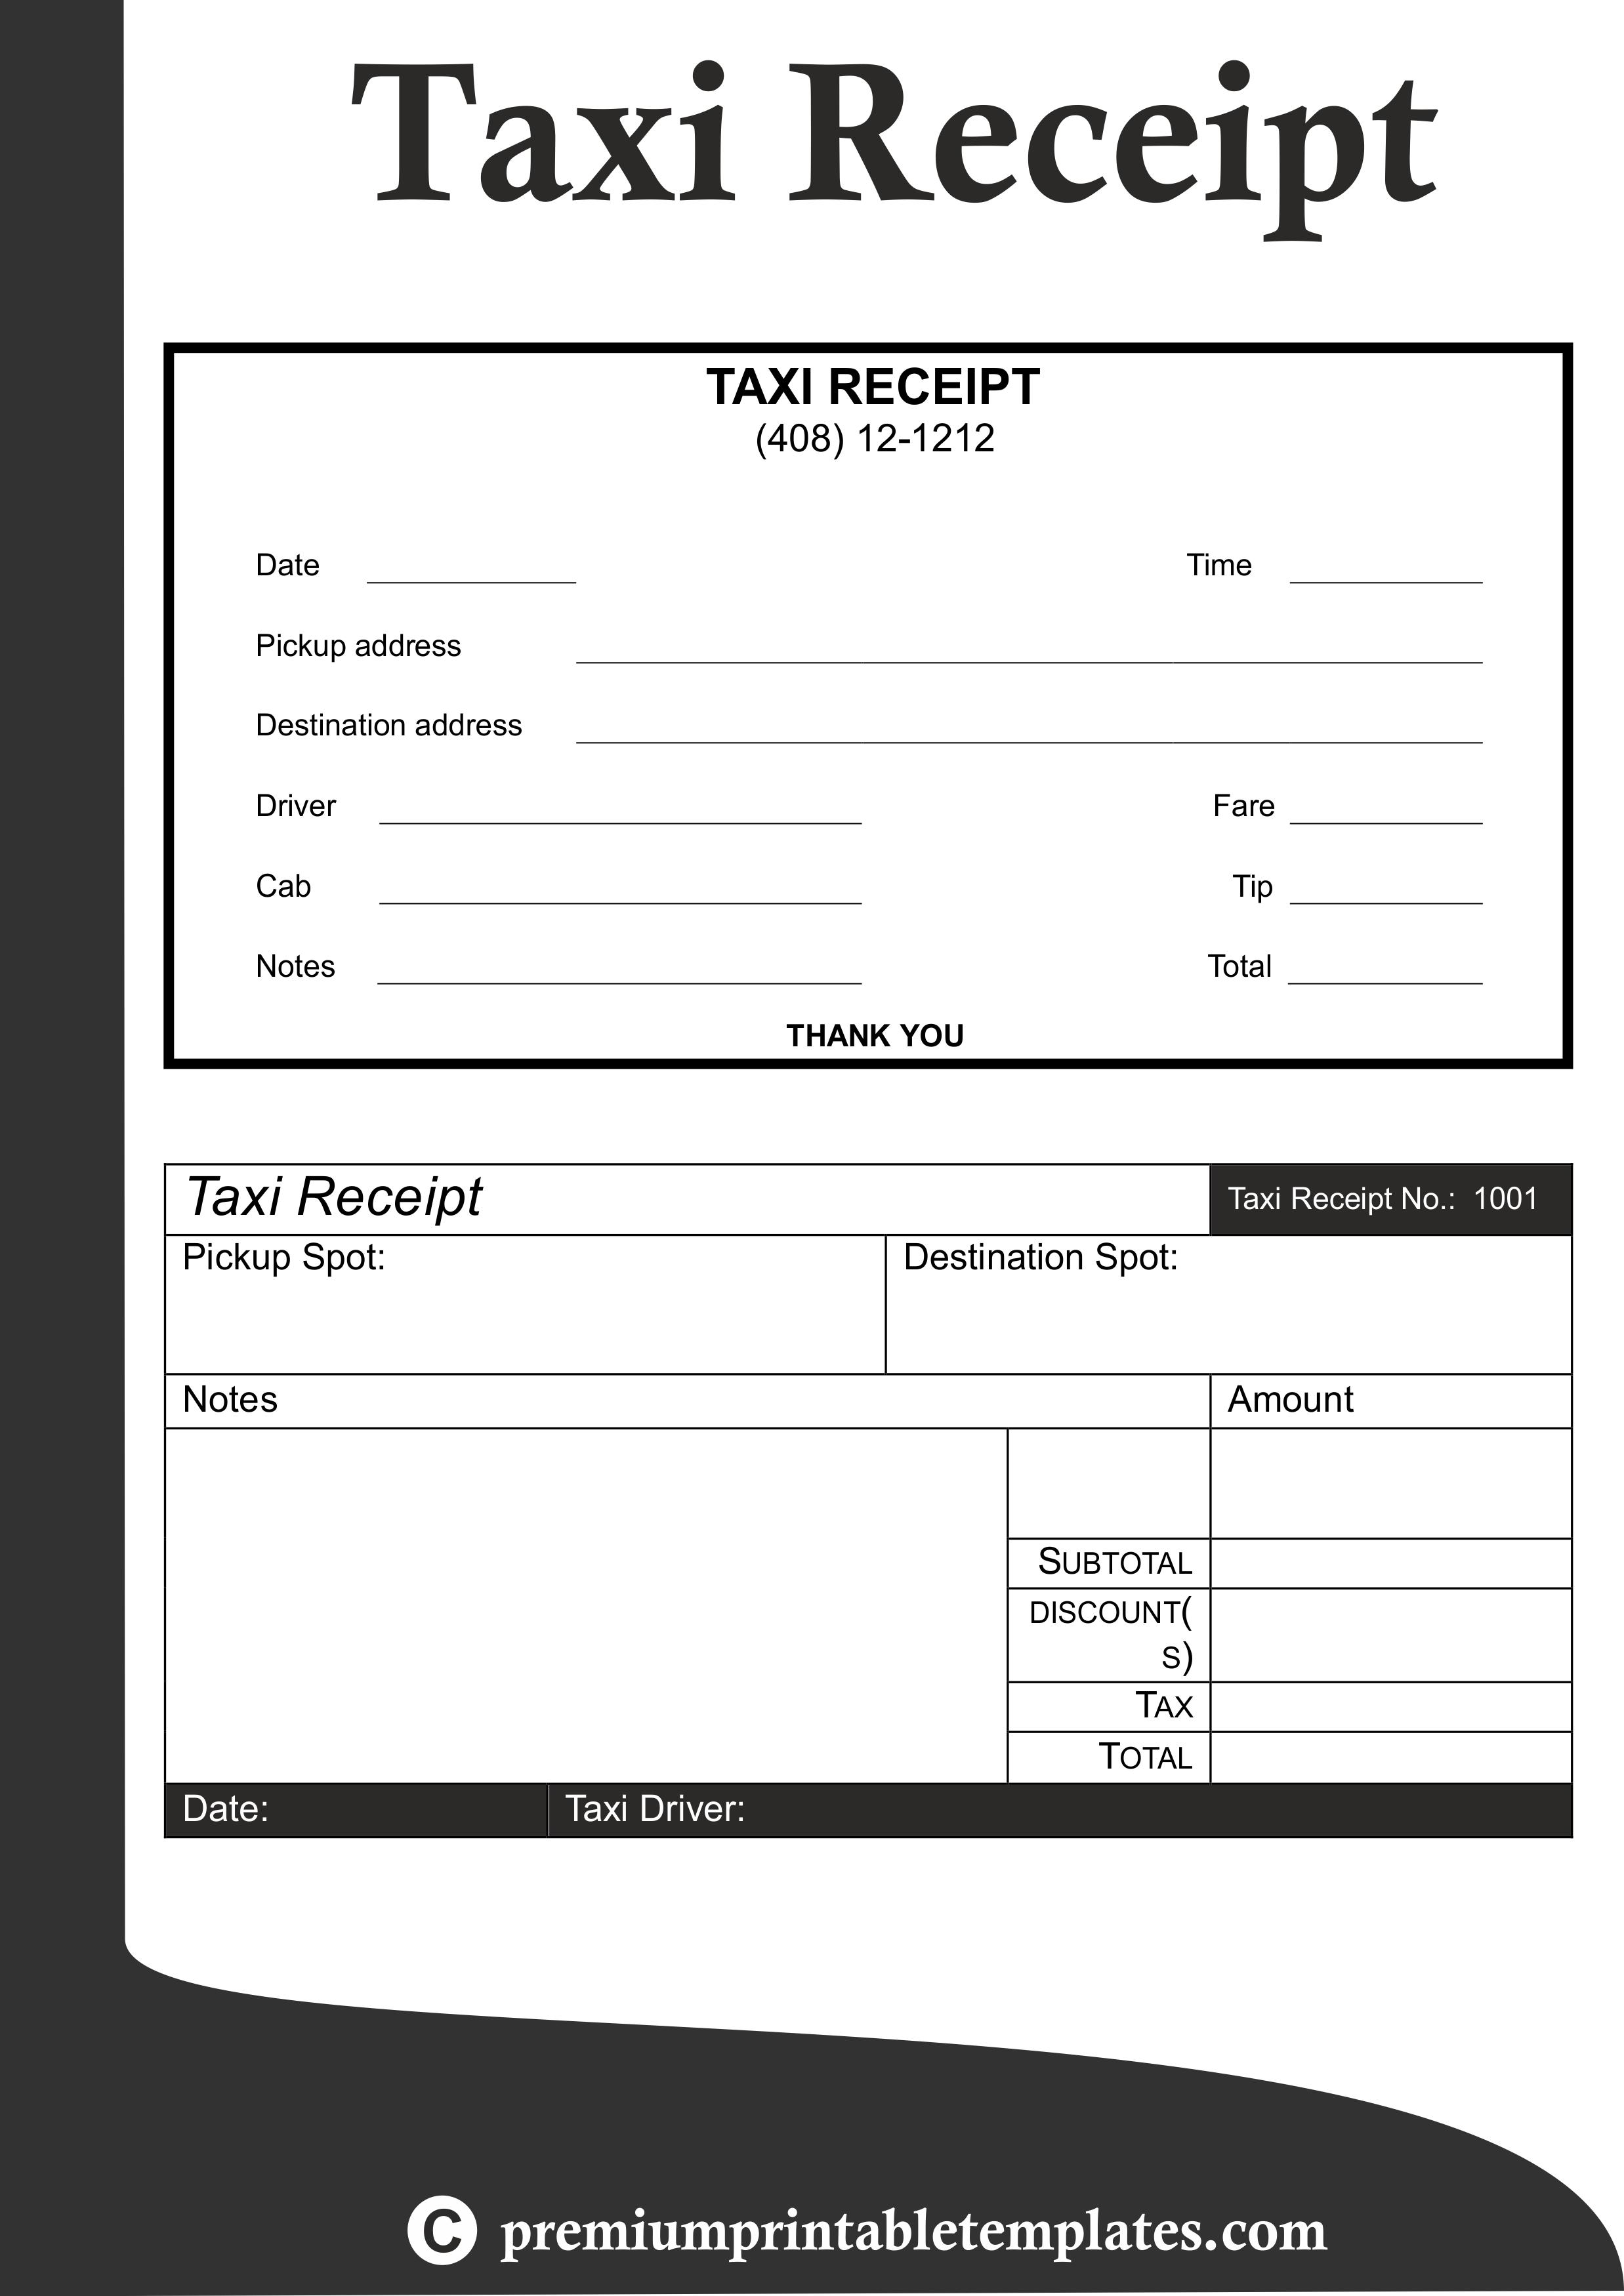 taxi receipt templates singapore taxi receipt template